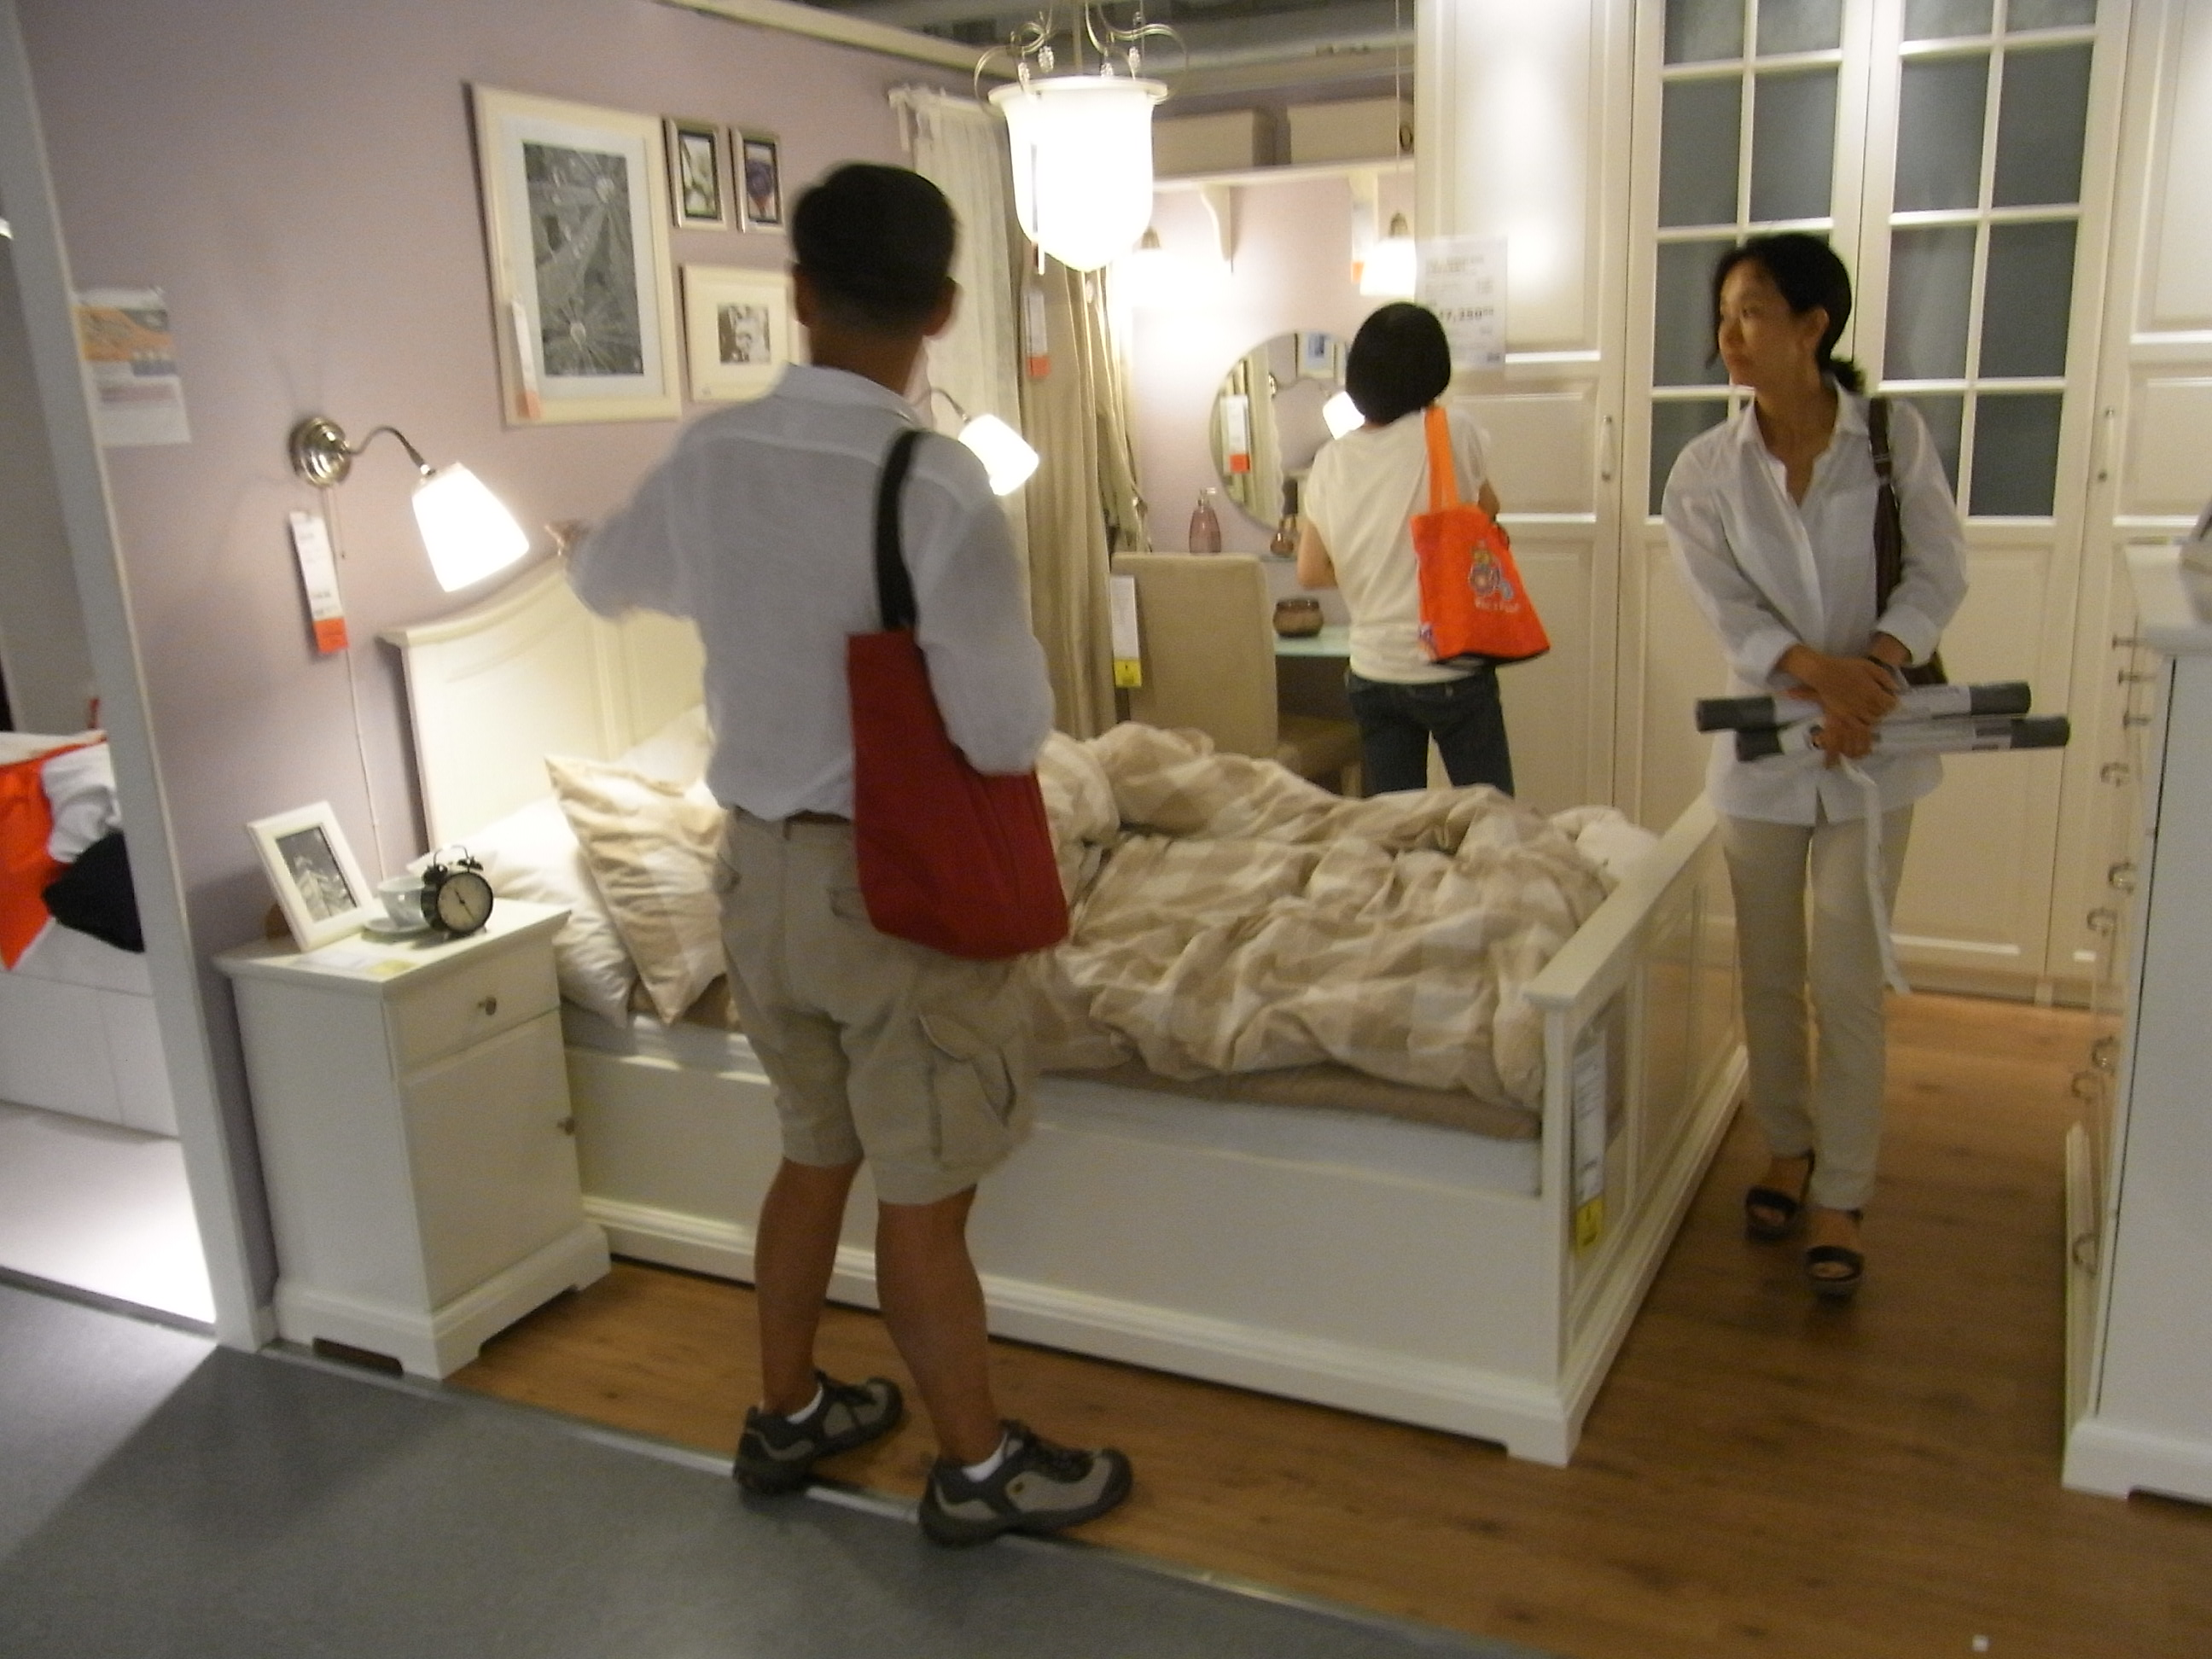 File:HK Causeway Bay IKEA Furniture Shop Interior Small Size Unit Design  Visitors July